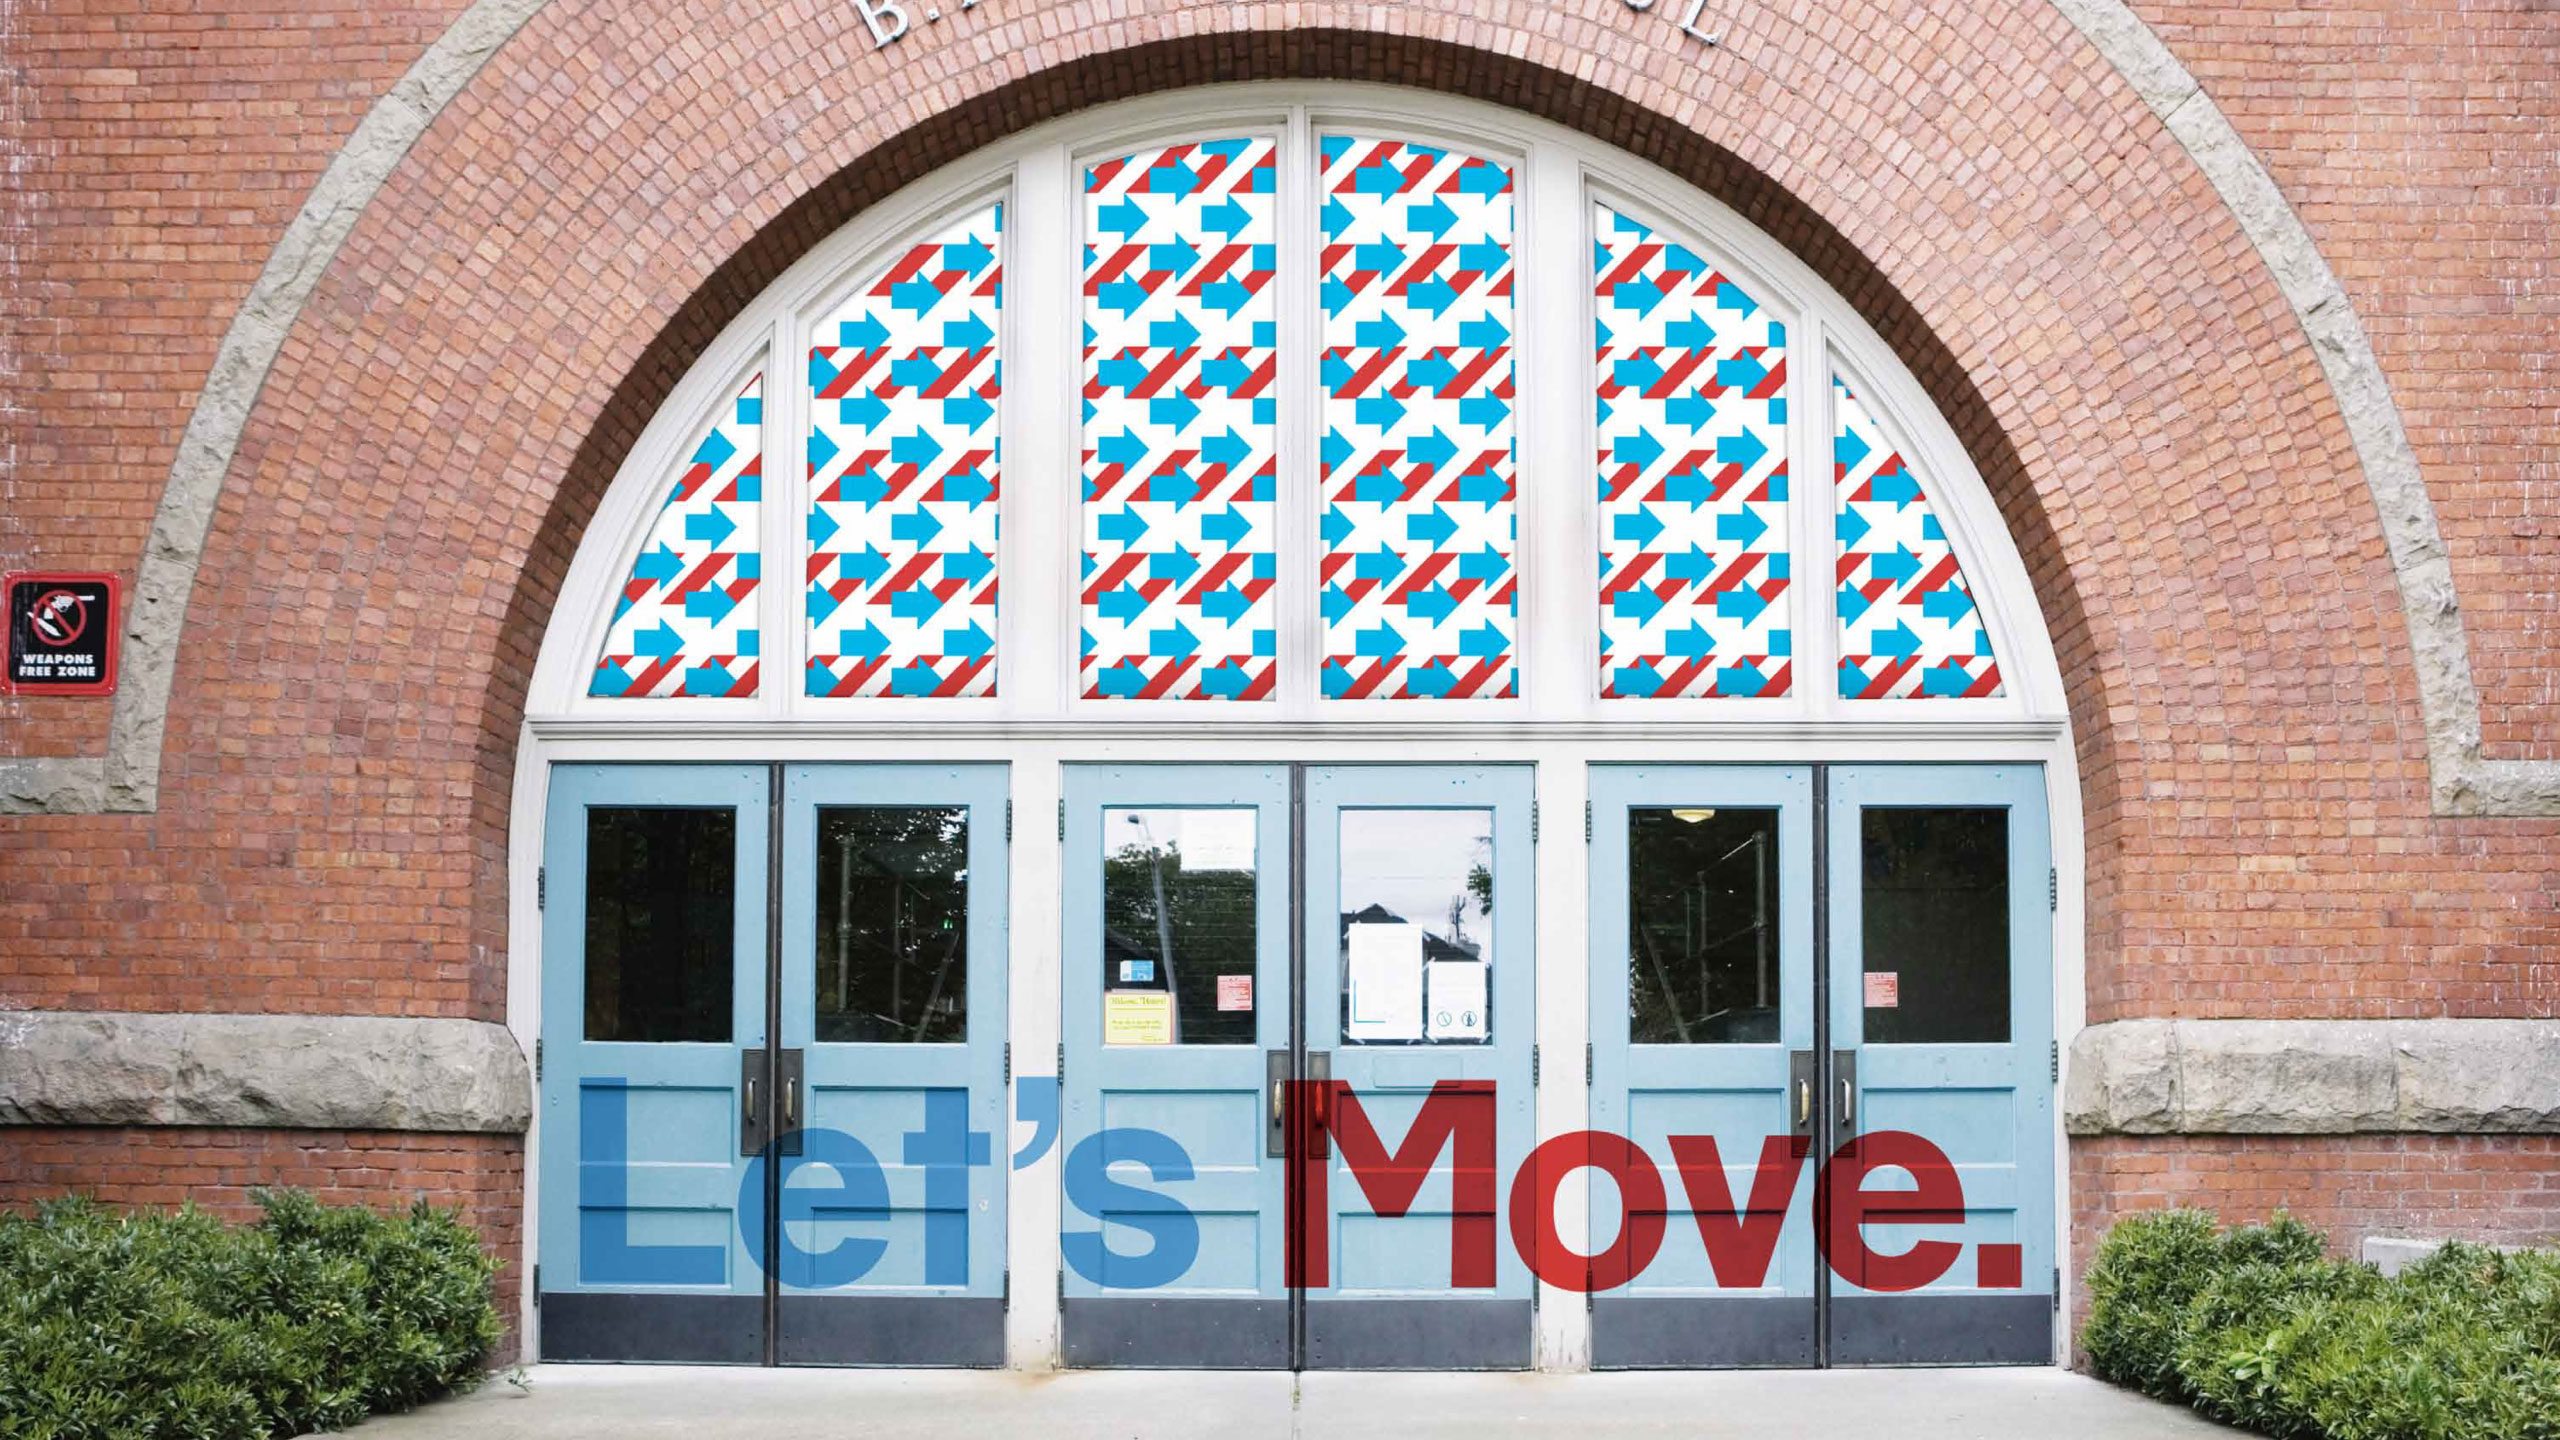 Let's Move school